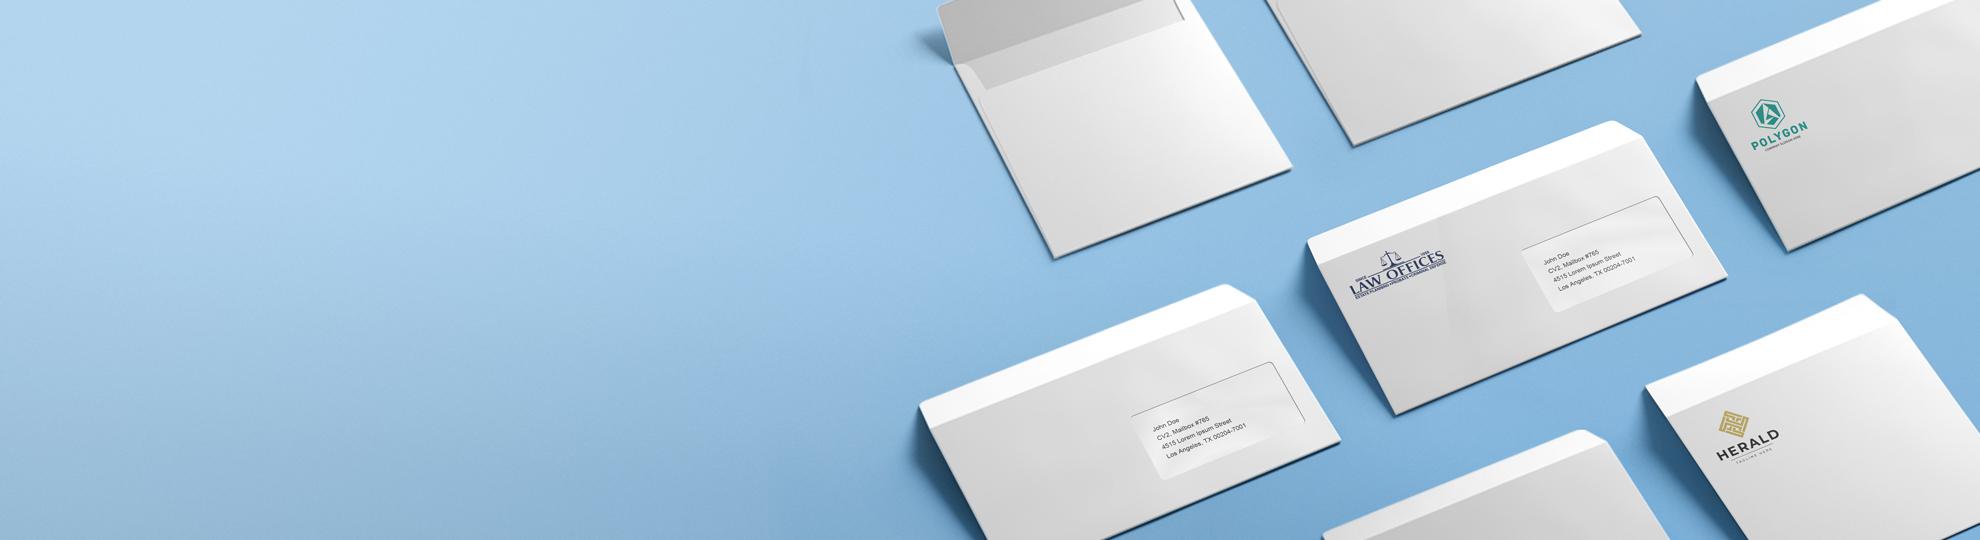 Imprimer enveloppes personnalisées en ligne